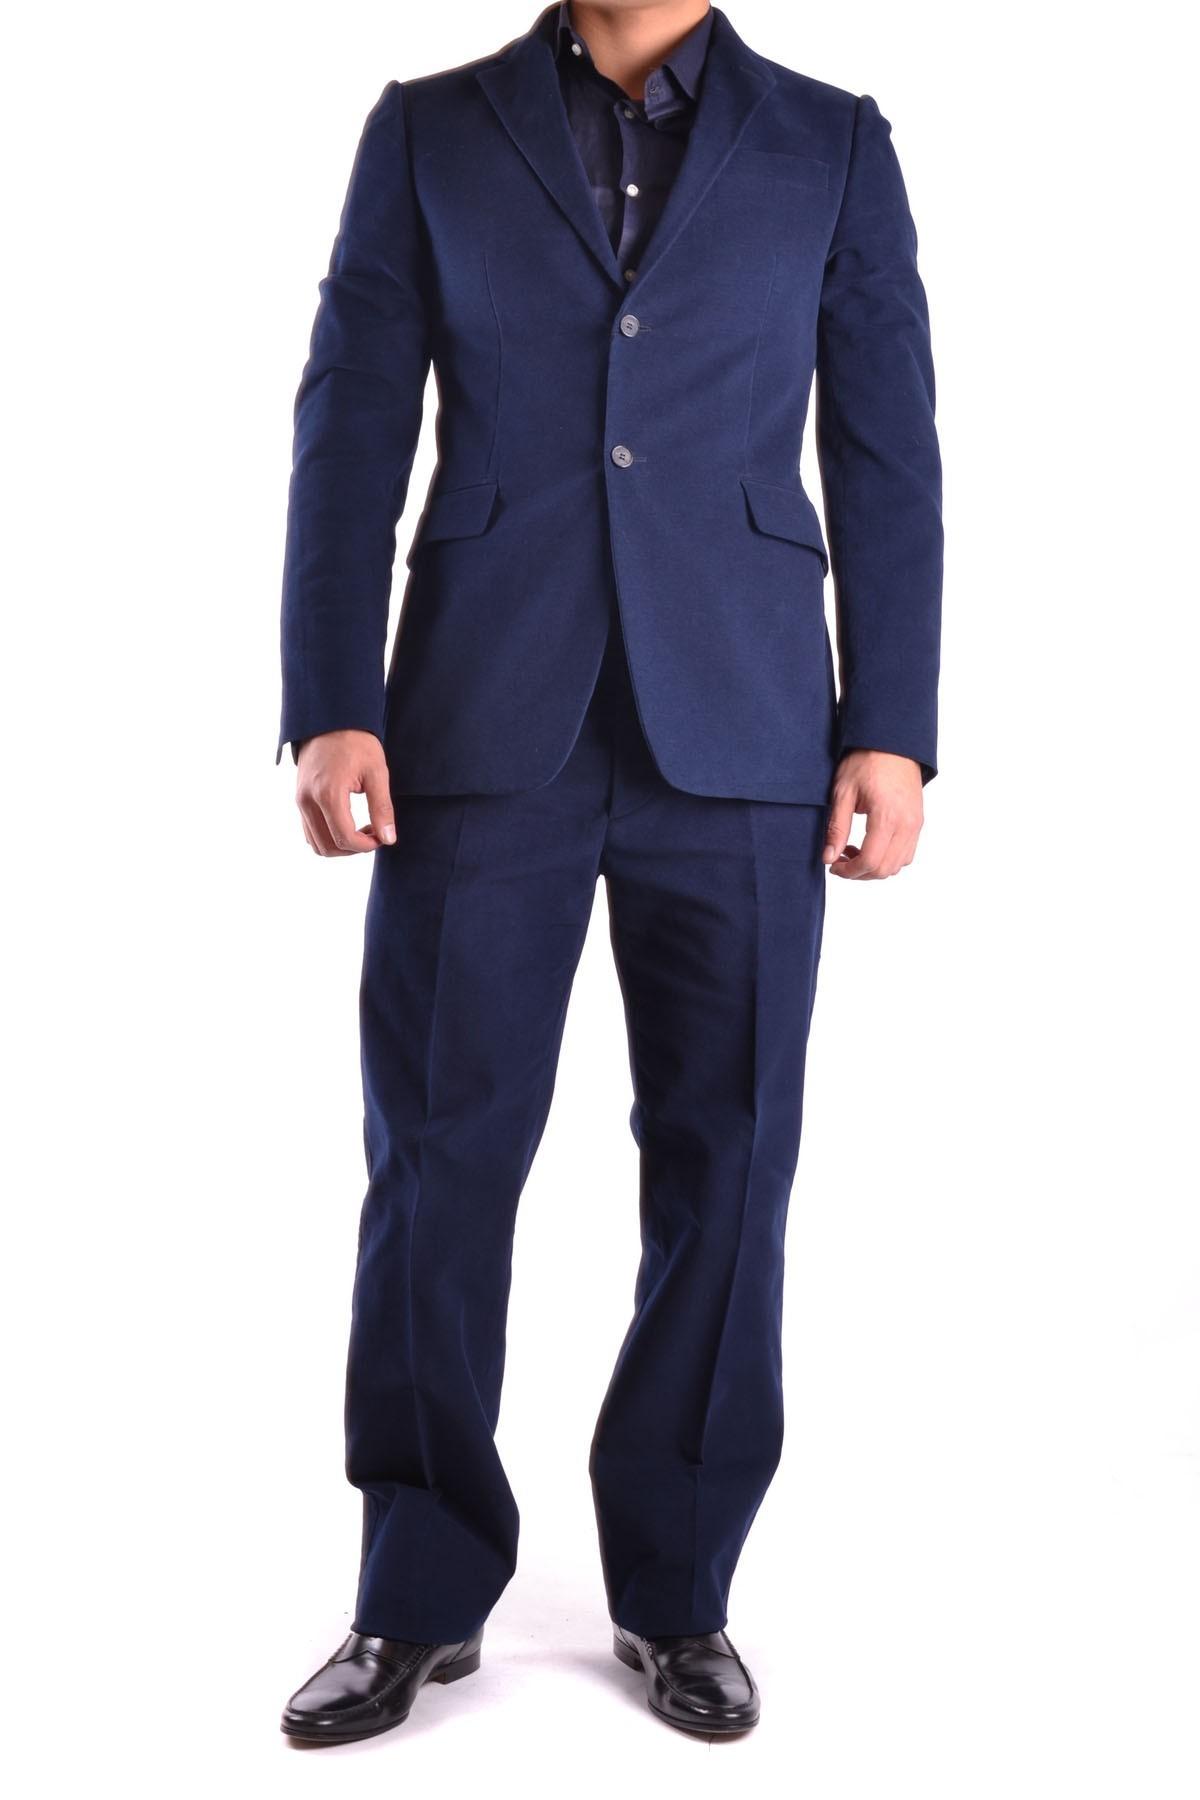 costume nationalMarchio: Costume National; Genere: Uomo; Tipologia: